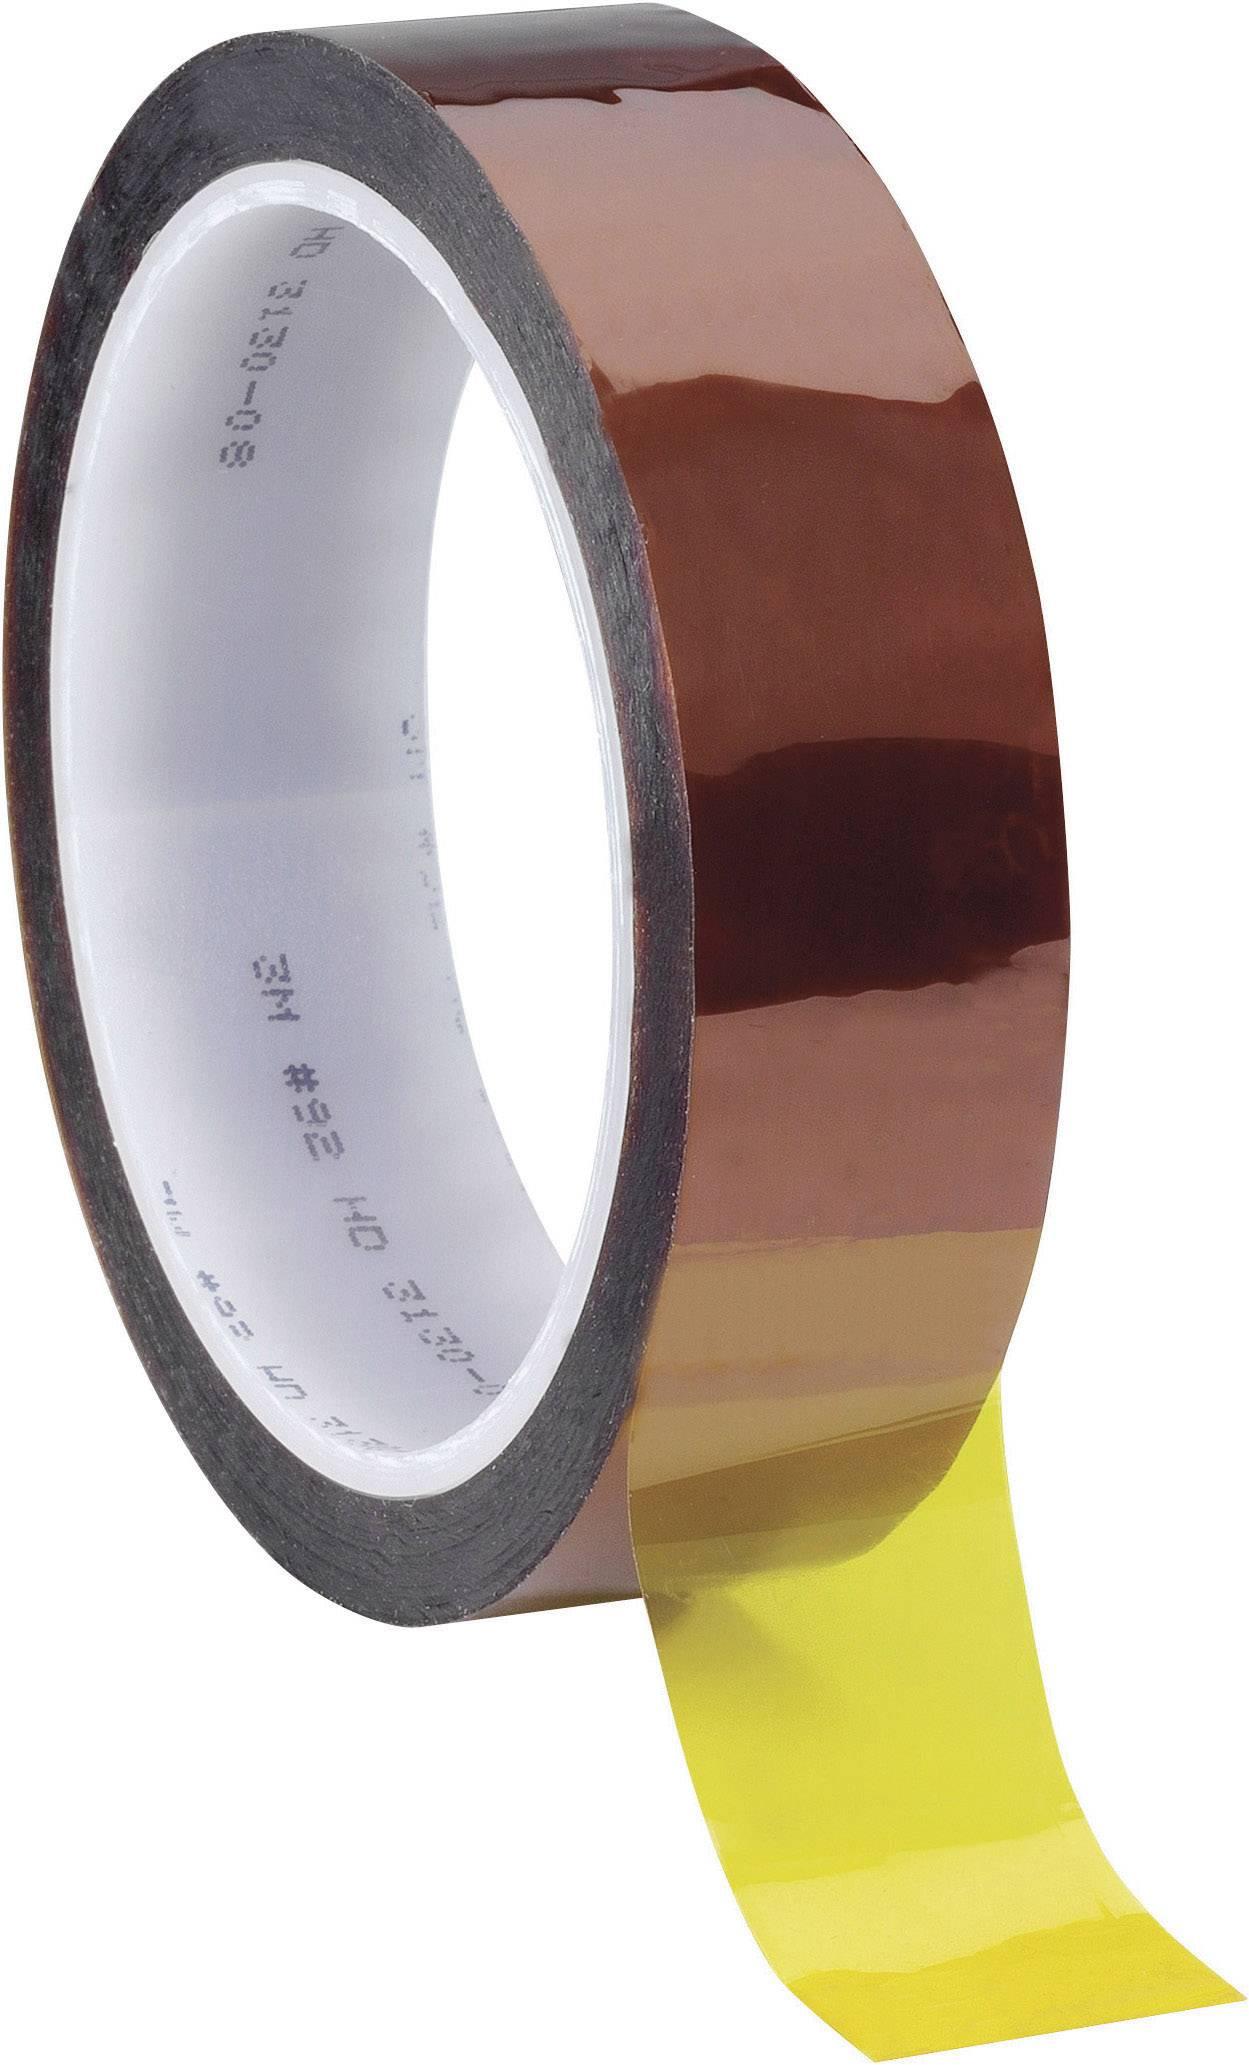 3M 929 Electrical tape Transparent (L x W) 33 m x 9 mm 1